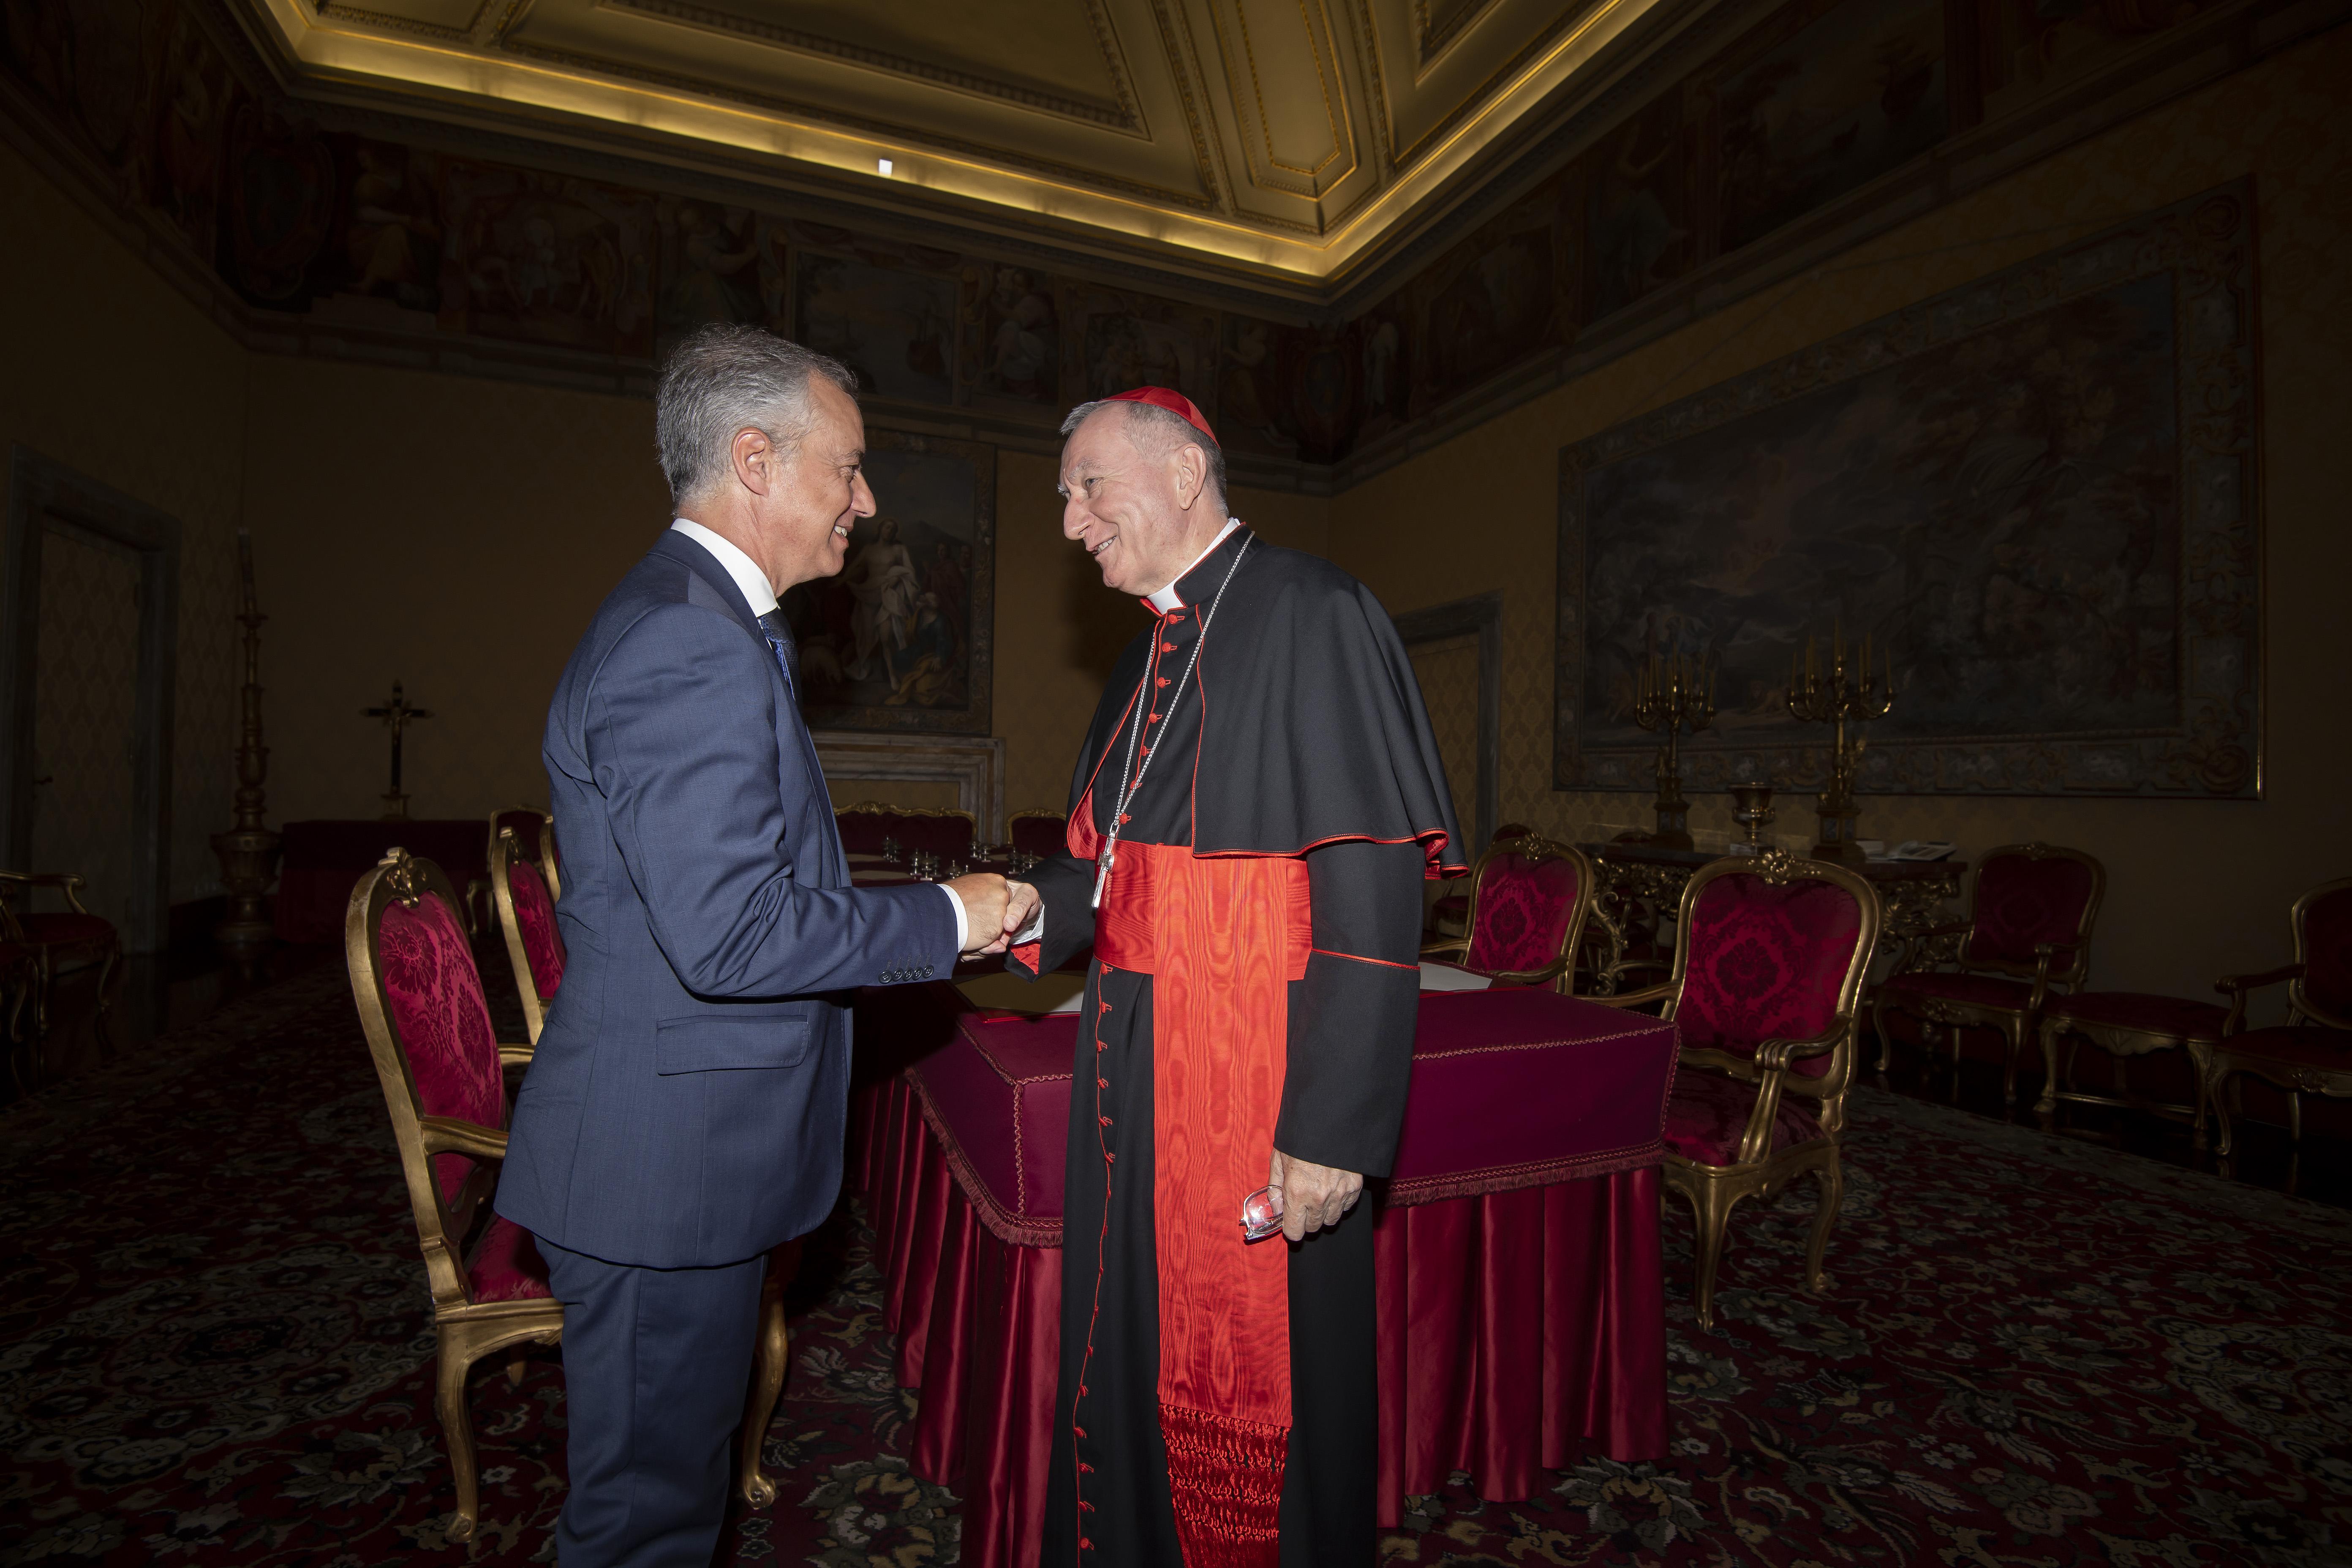 2019_08_28_lhk_secretario_estado_vaticano.jpg